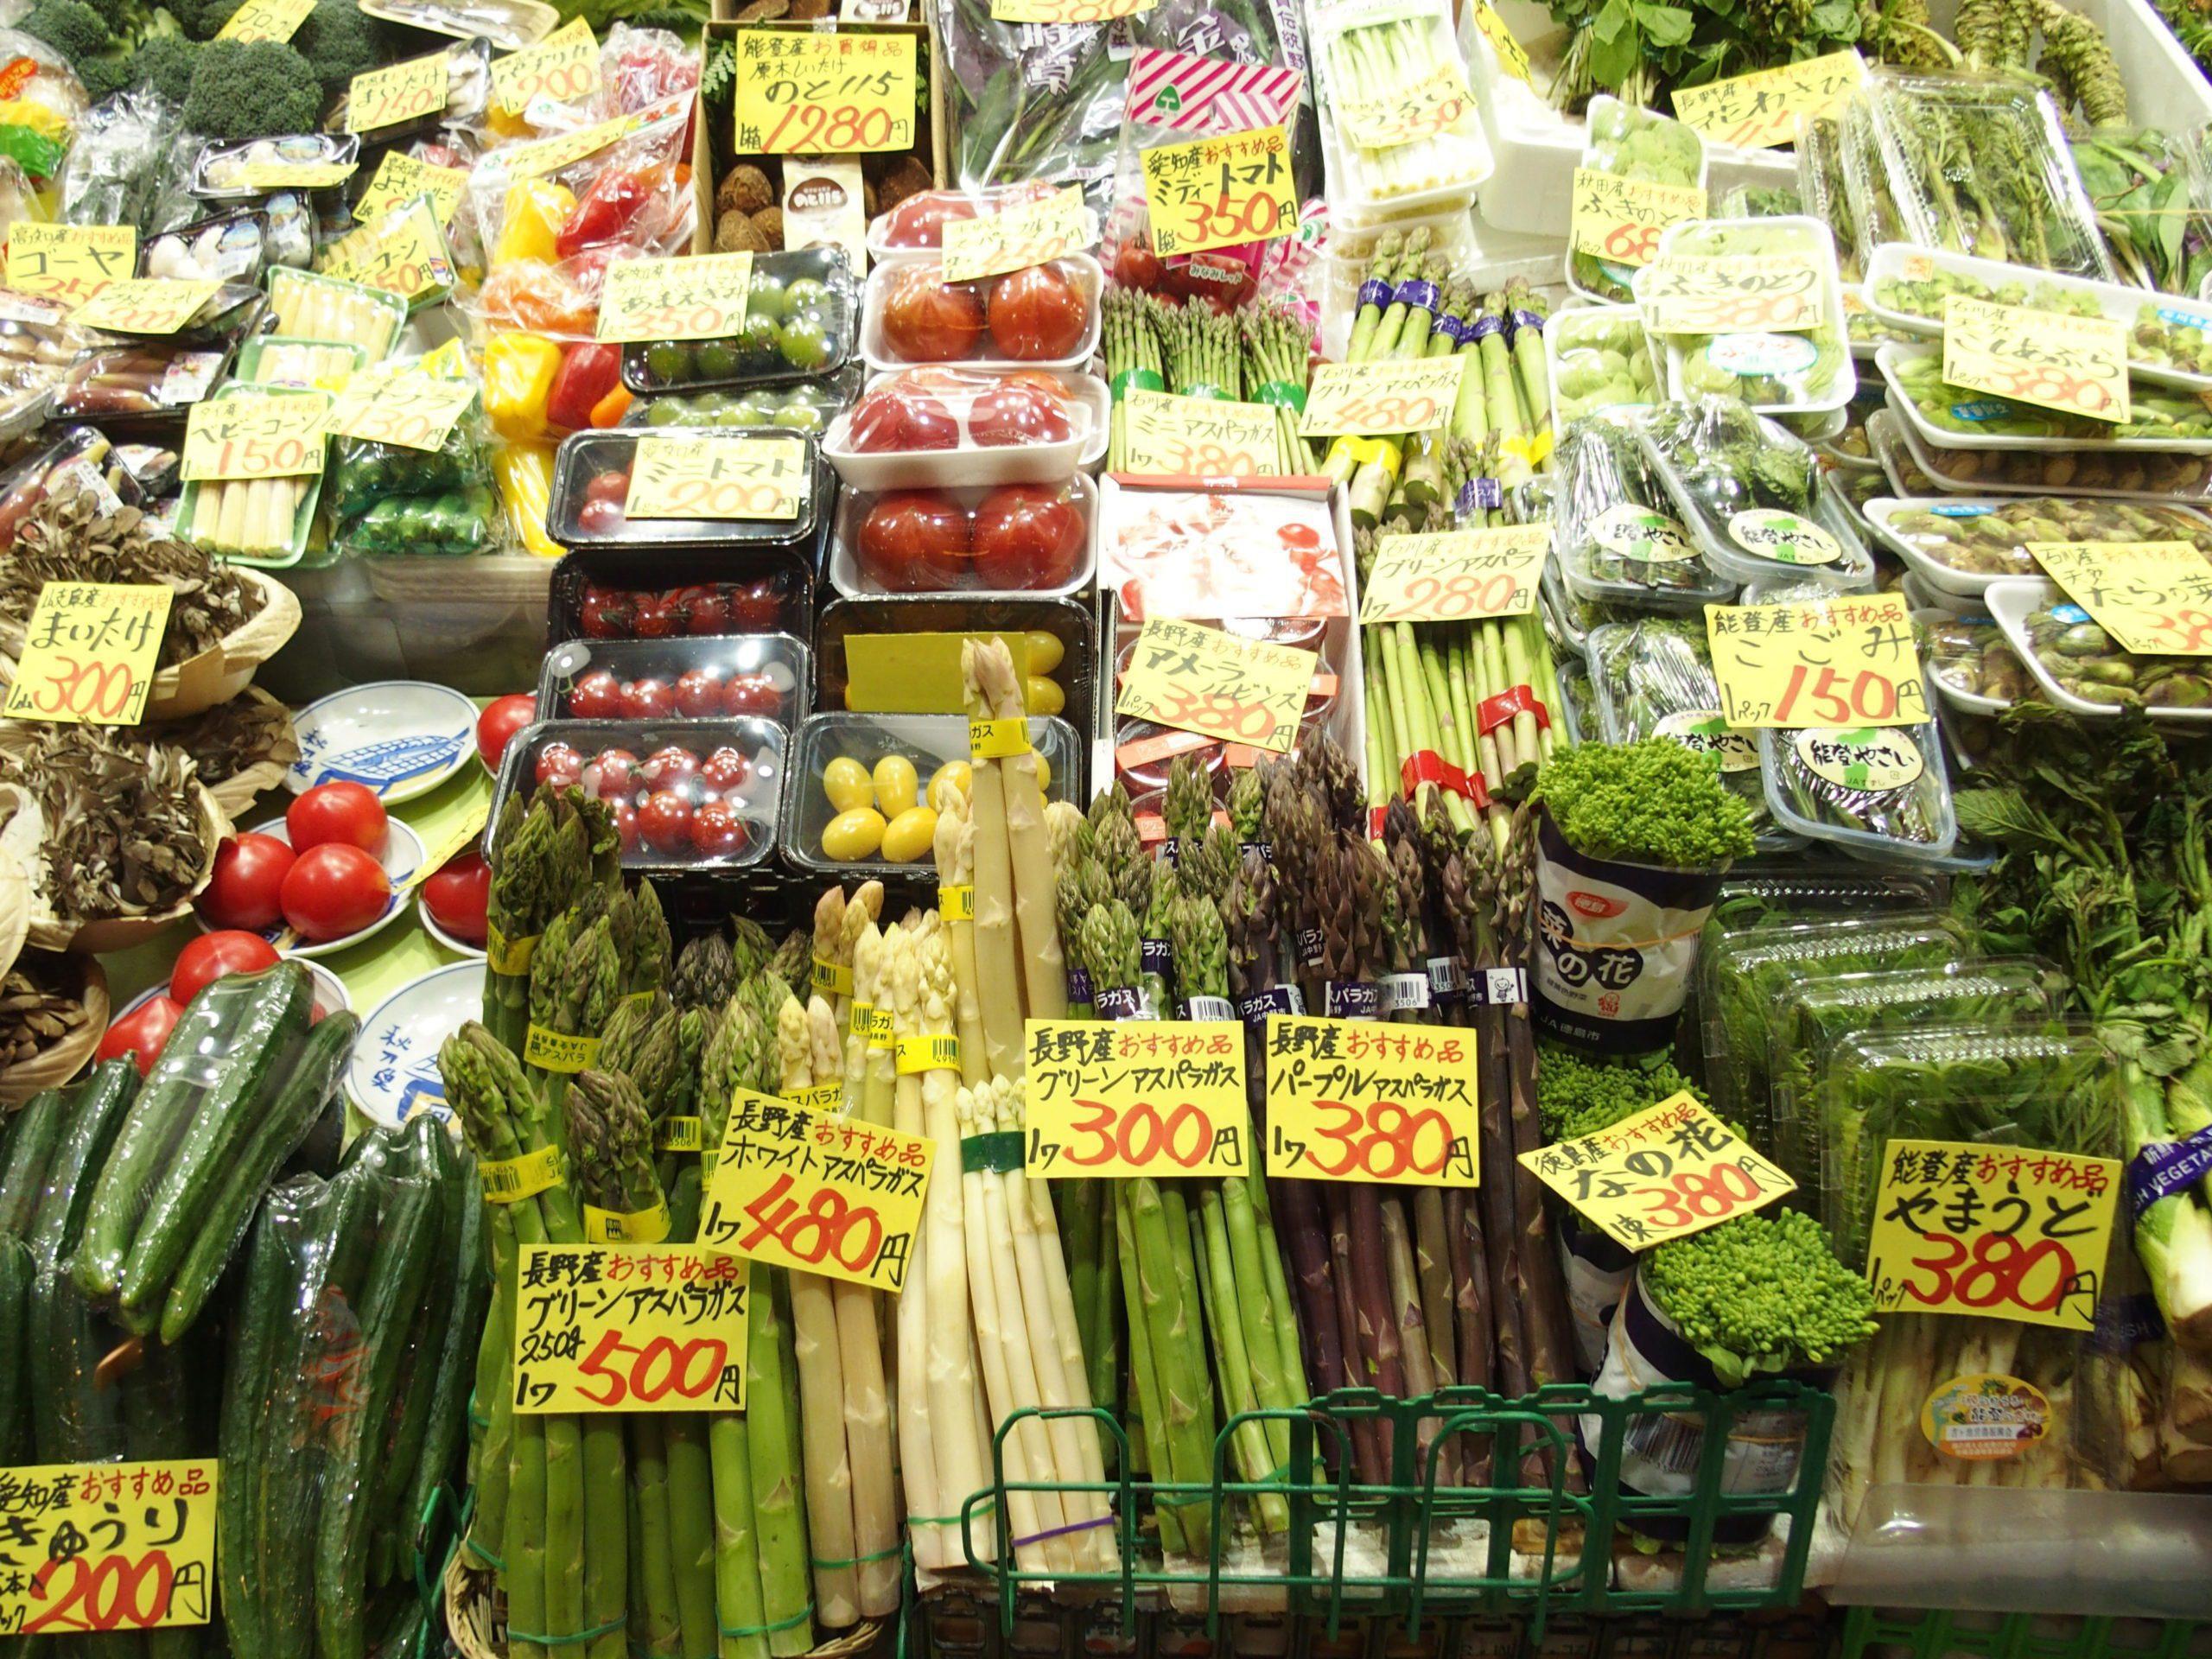 Bel étal de légumes marché Omicho Kanazawa Japon